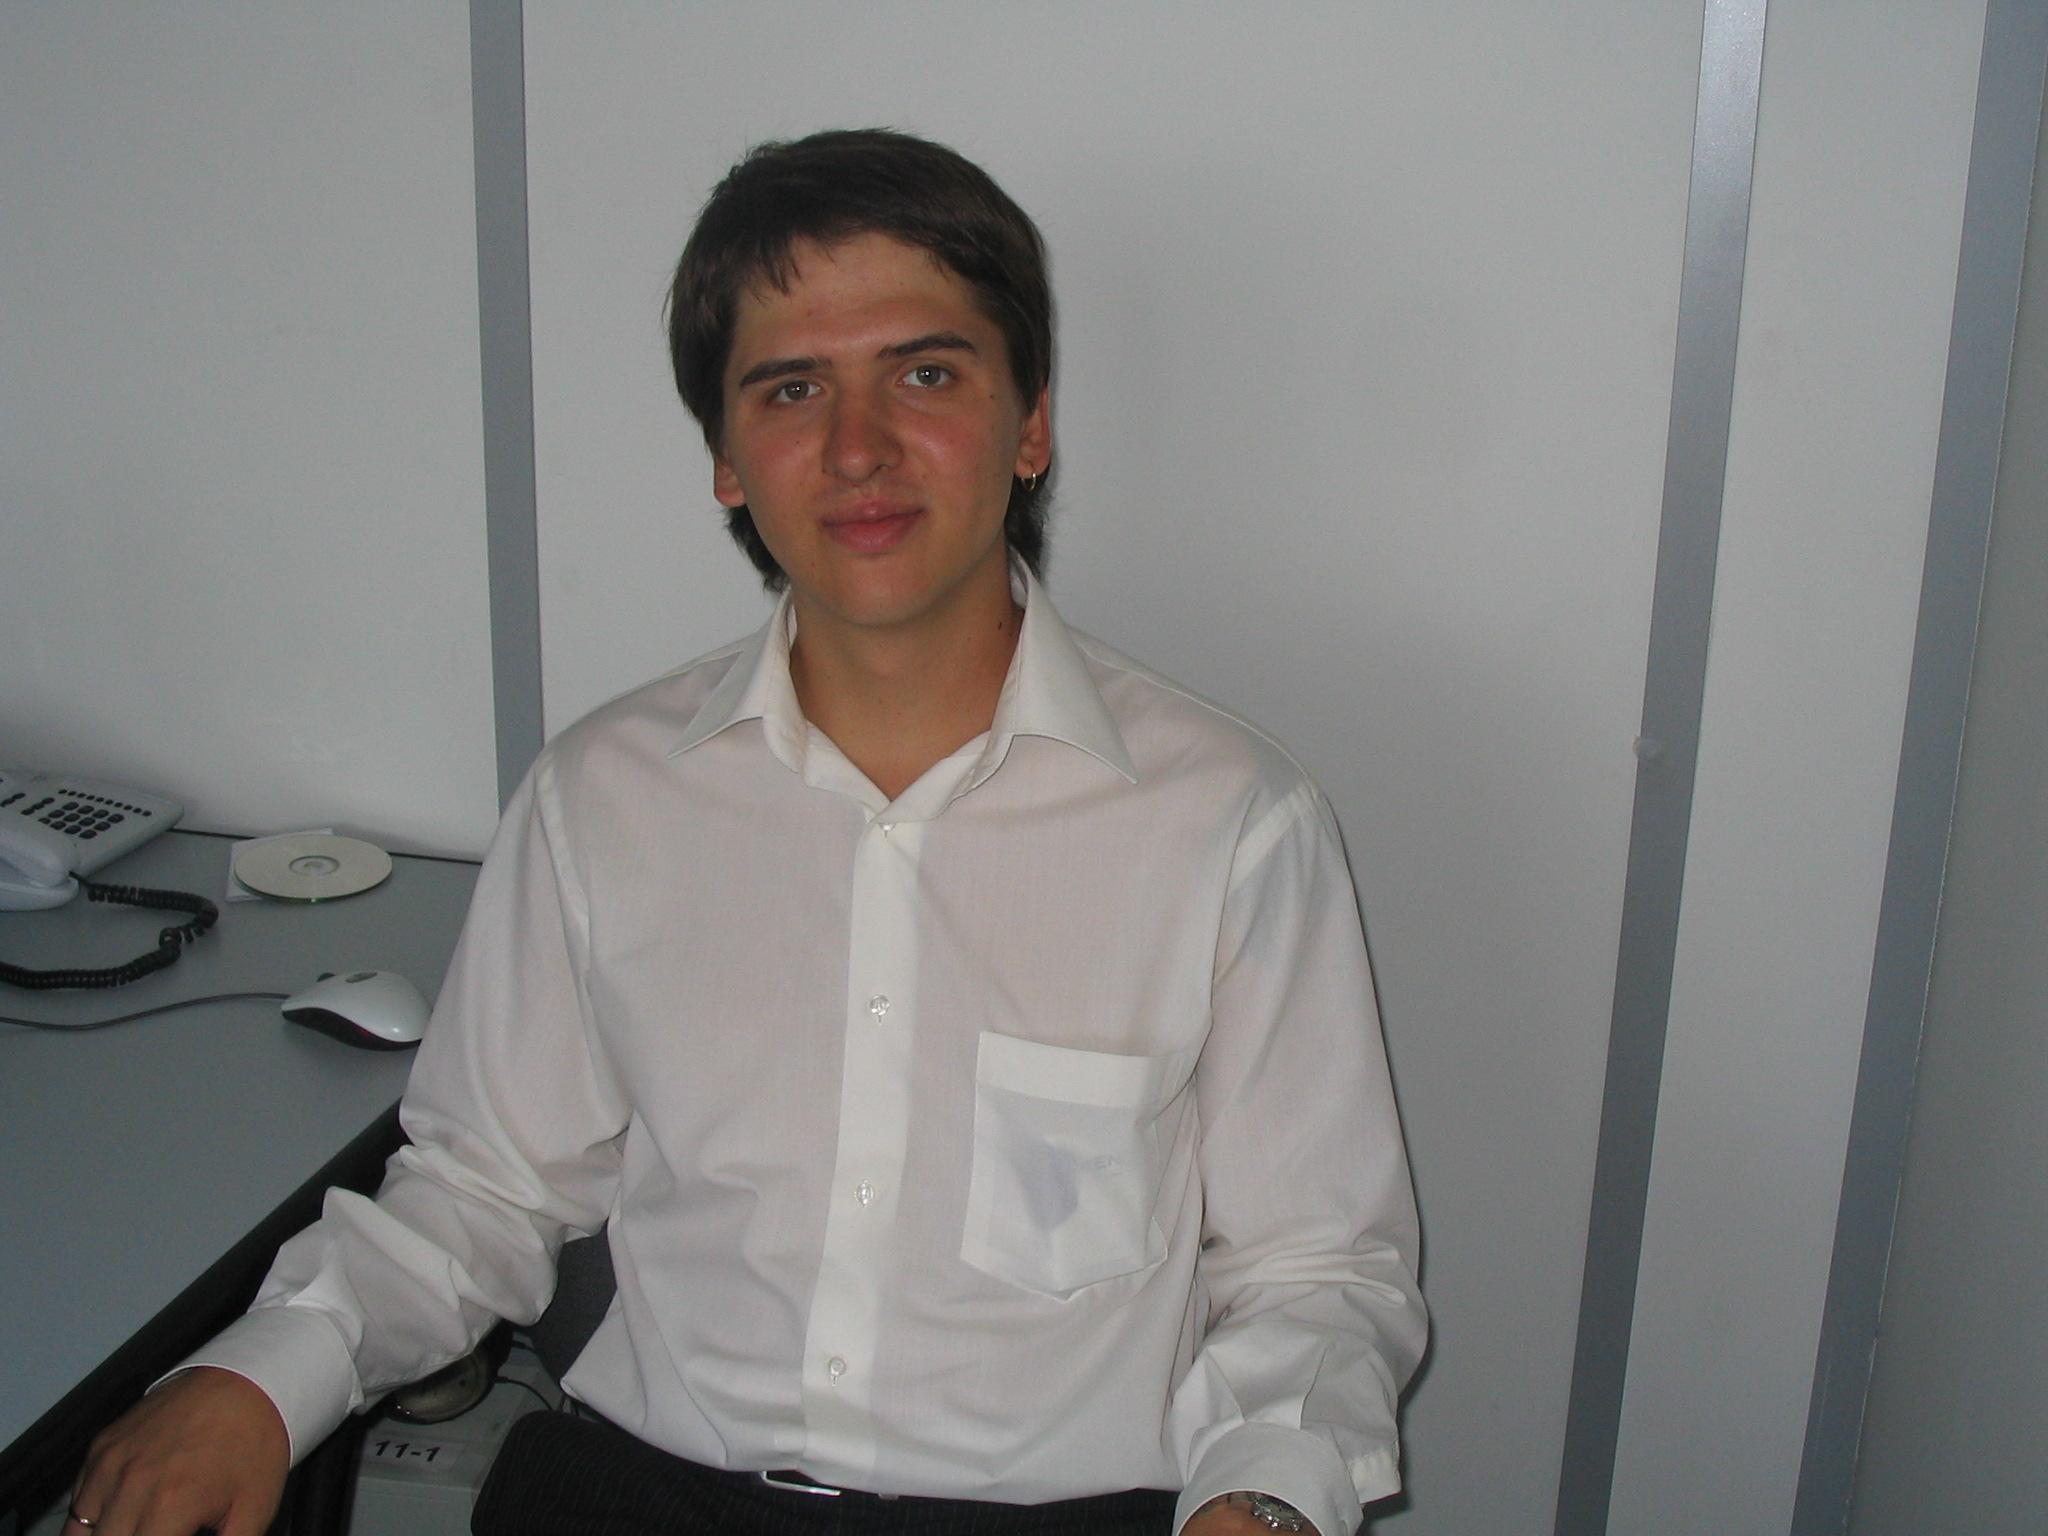 Воронцов Дмитрий Сергеевич